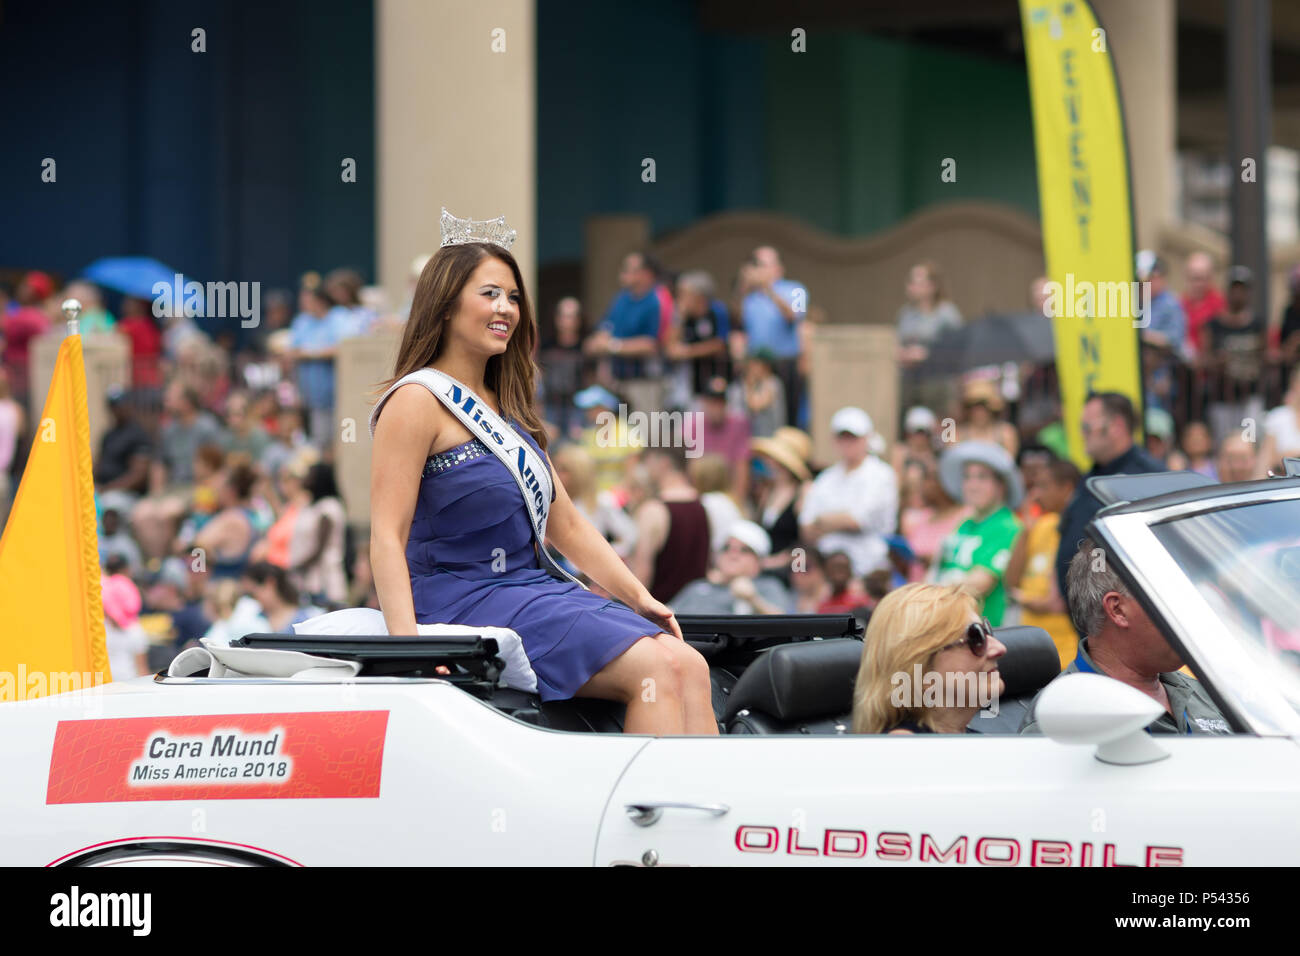 Indianapolis, Indiana, USA - 26. Mai 2018, Cara, Mund, Miss America 2018 Reiten auf einem Oldsmobile 1970 classic car, bei der Indy 500 Parade Stockbild